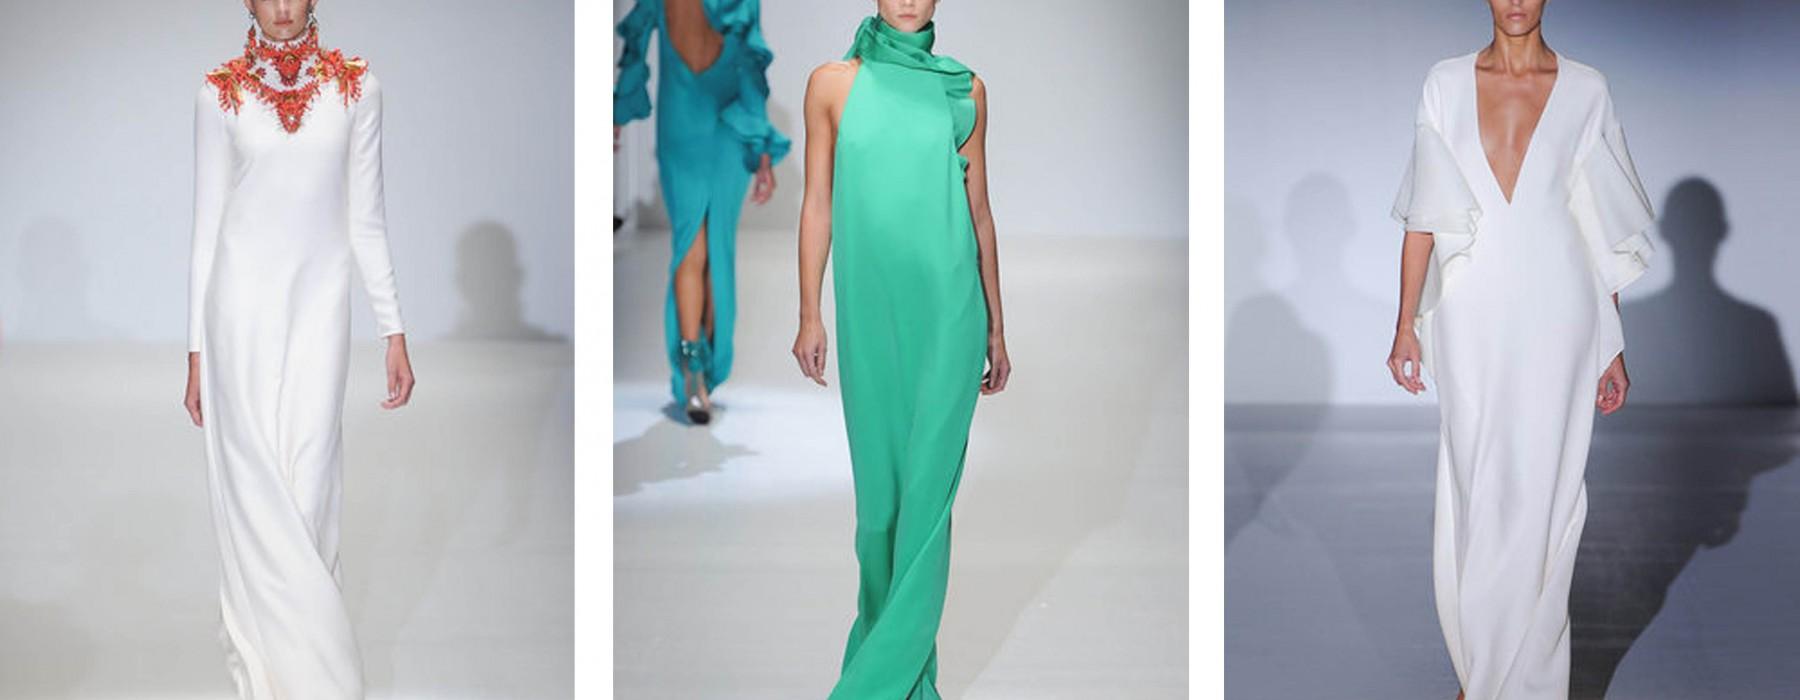 Gucci Spring 2013 Fashion Show